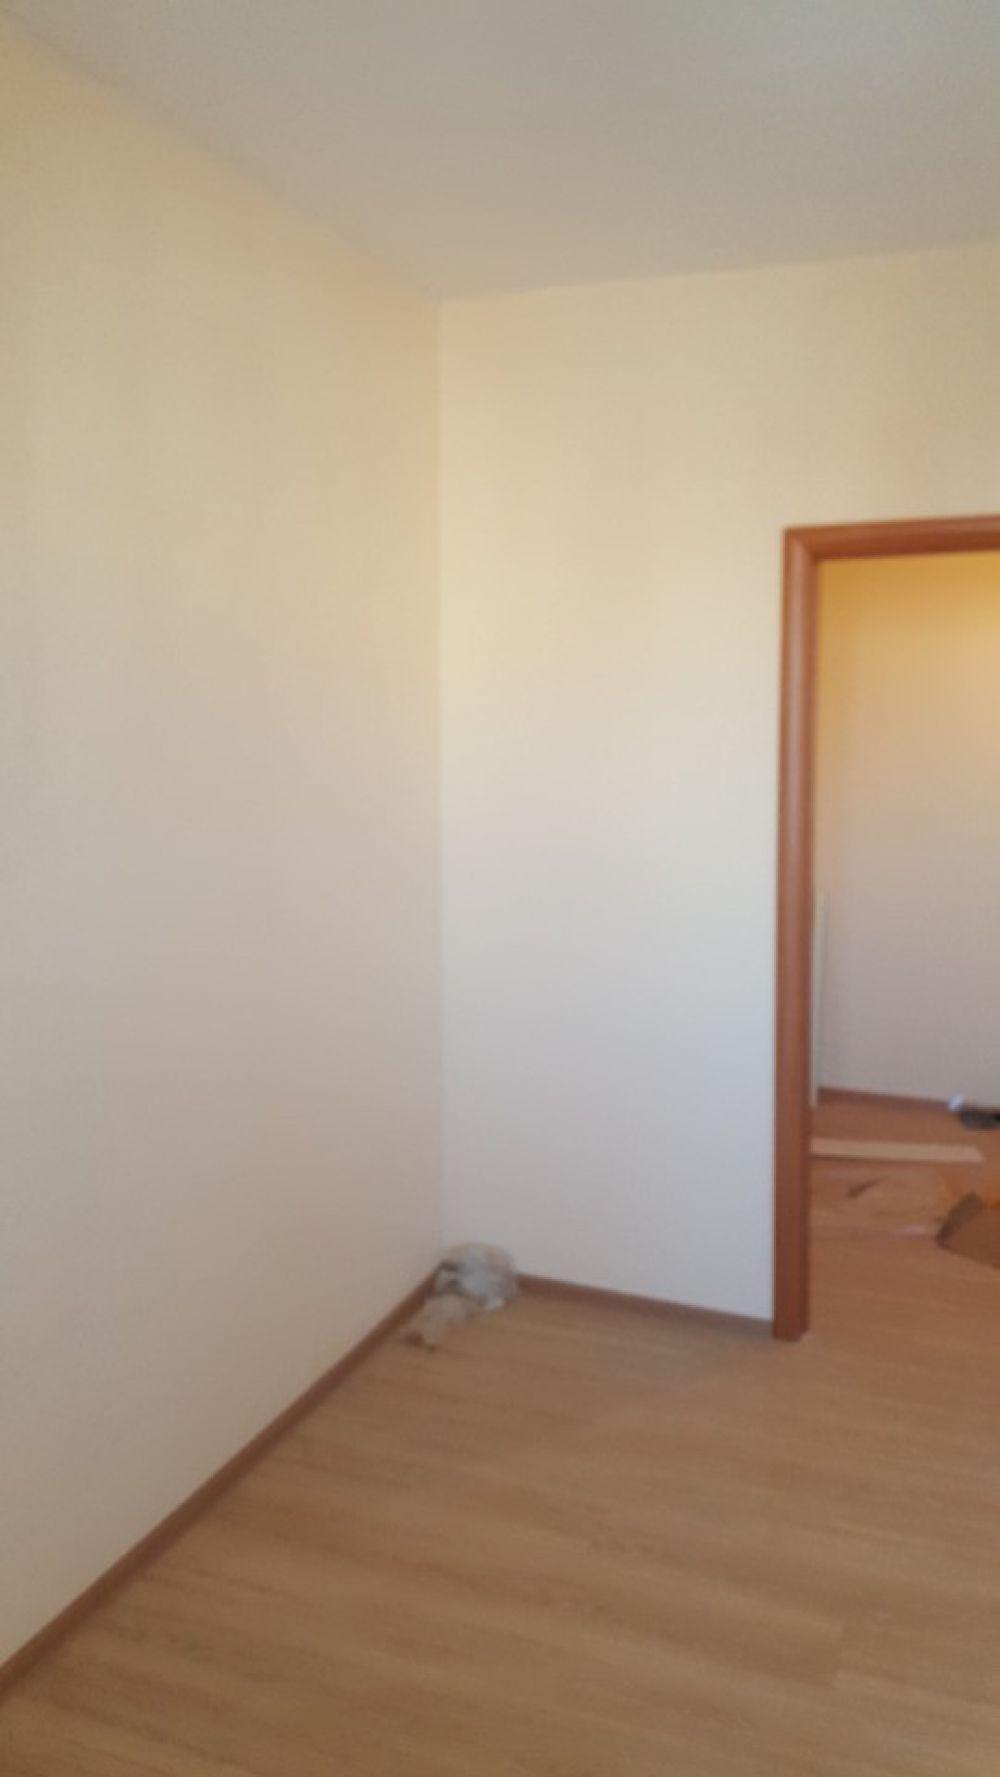 1-к квартира 30 м2, Щёлково, микрорайон Богородский, 16, фото 7